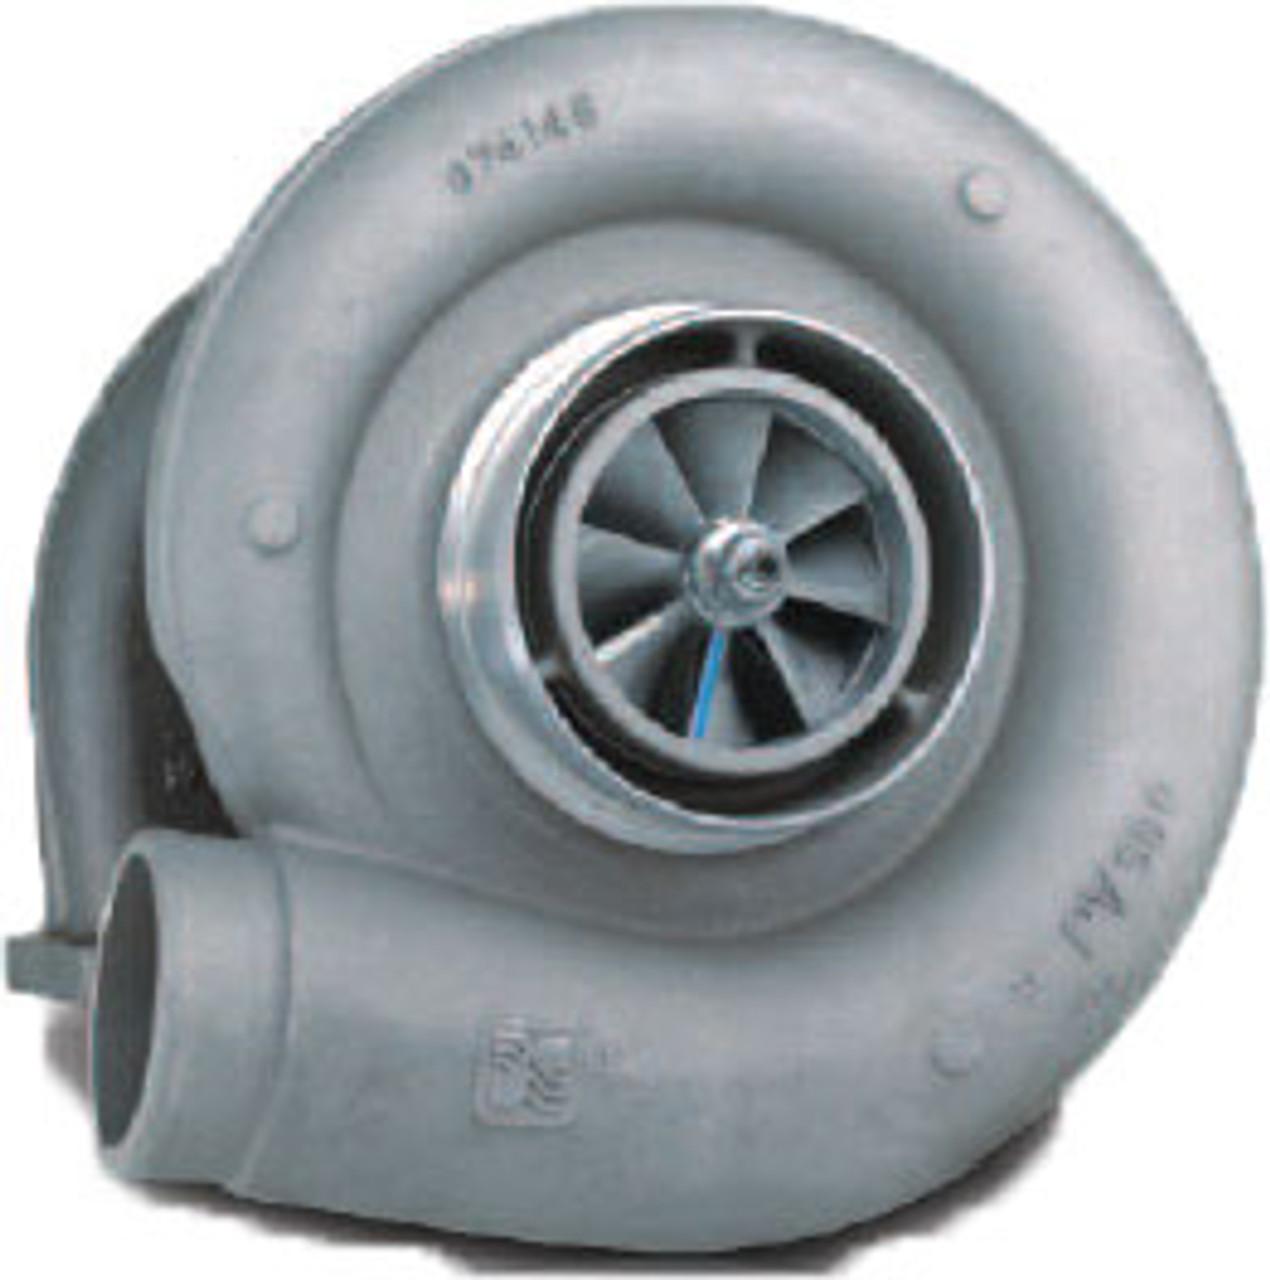 Shop Turbo Specific: Borg Warner S510 Turbocharger